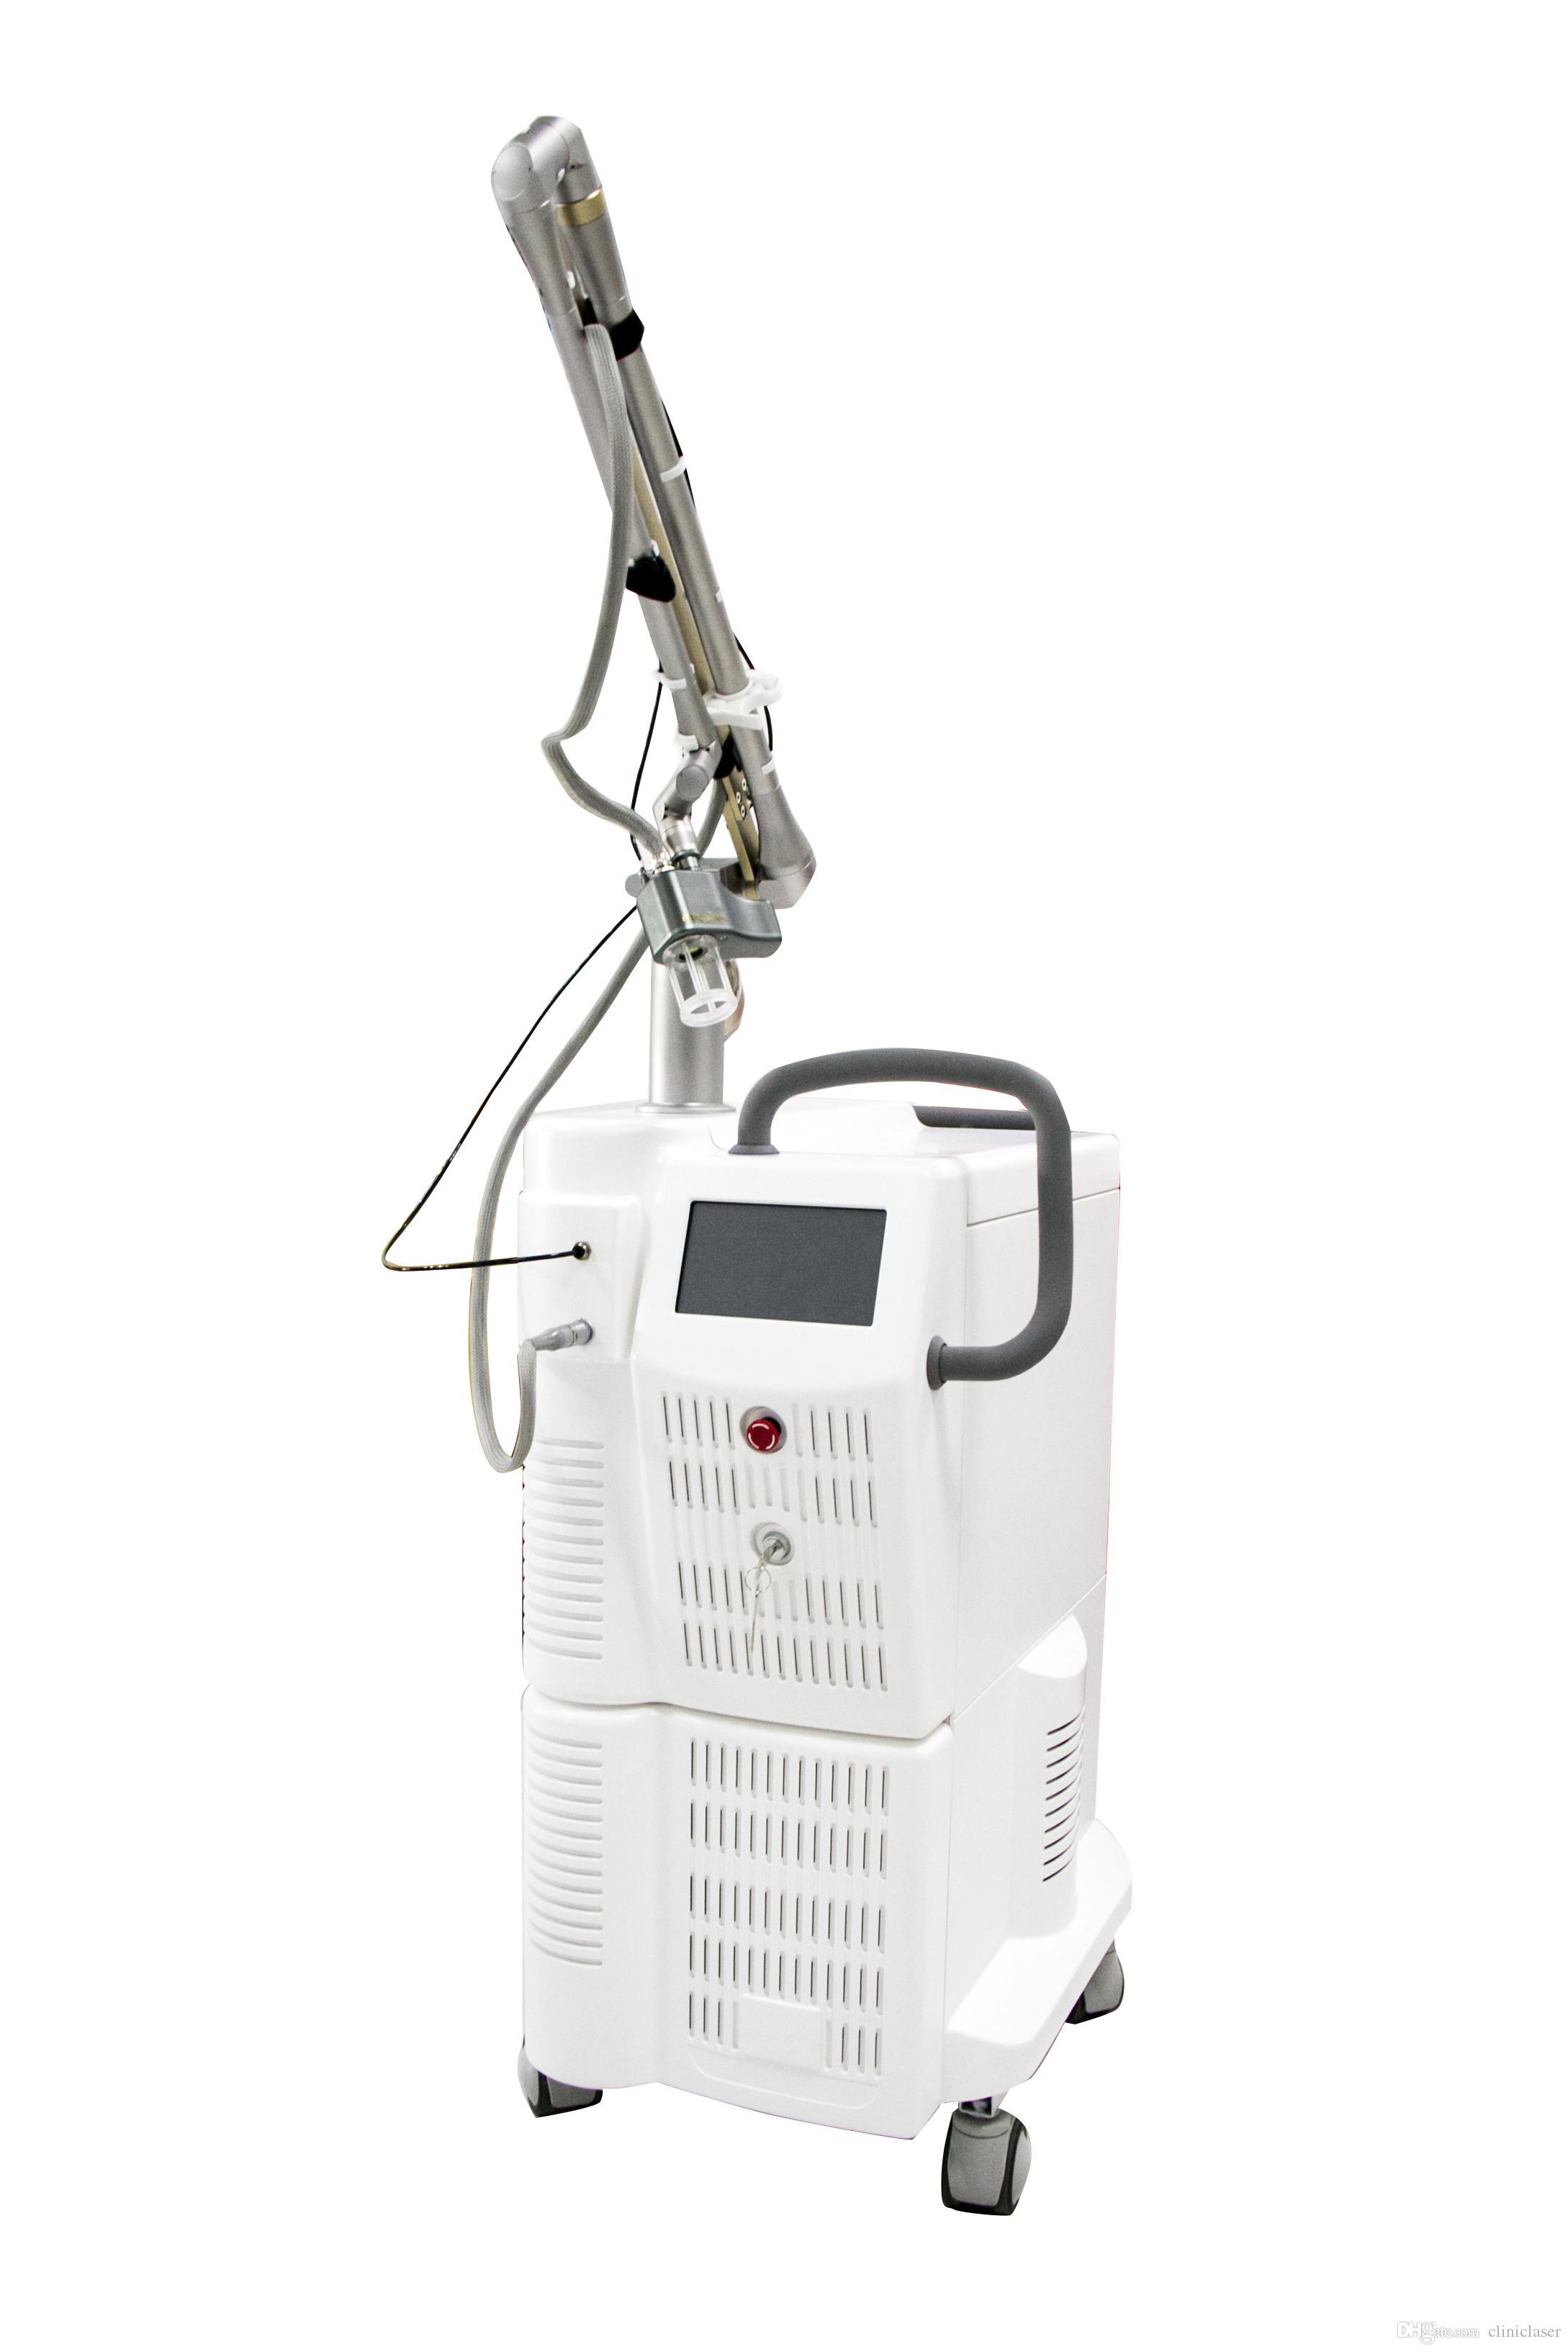 10600NM 60W RF 이산화탄소 분수 레이저 질 강화 기계, 피부 resurfacing 및 vaginal 강화 beauyu 장비